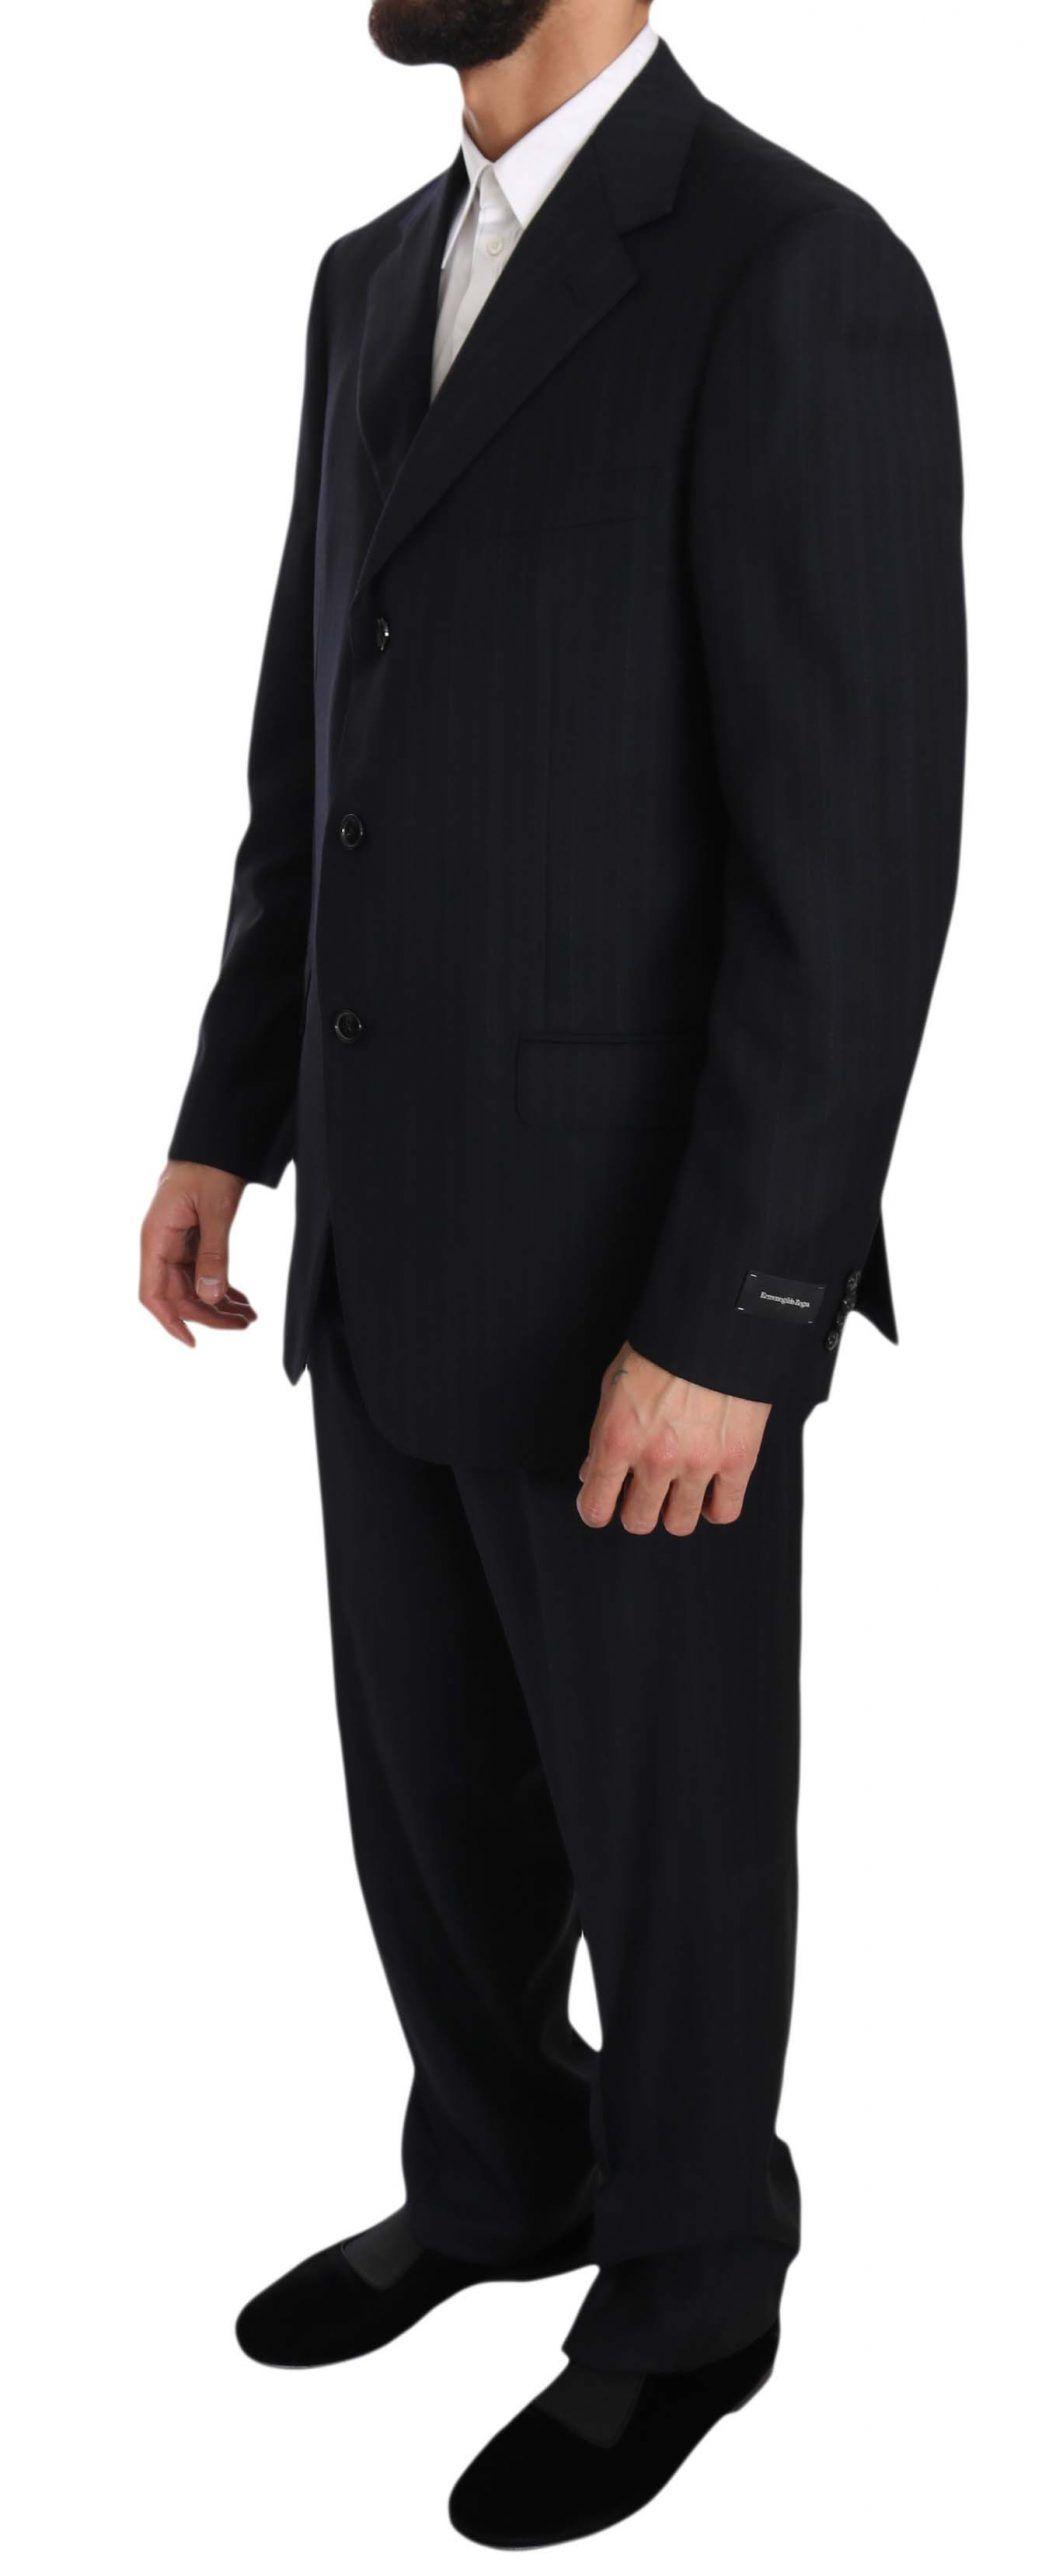 Ermenegildo Zegna Black Stripe Two Piece 3 Button Wool Suit